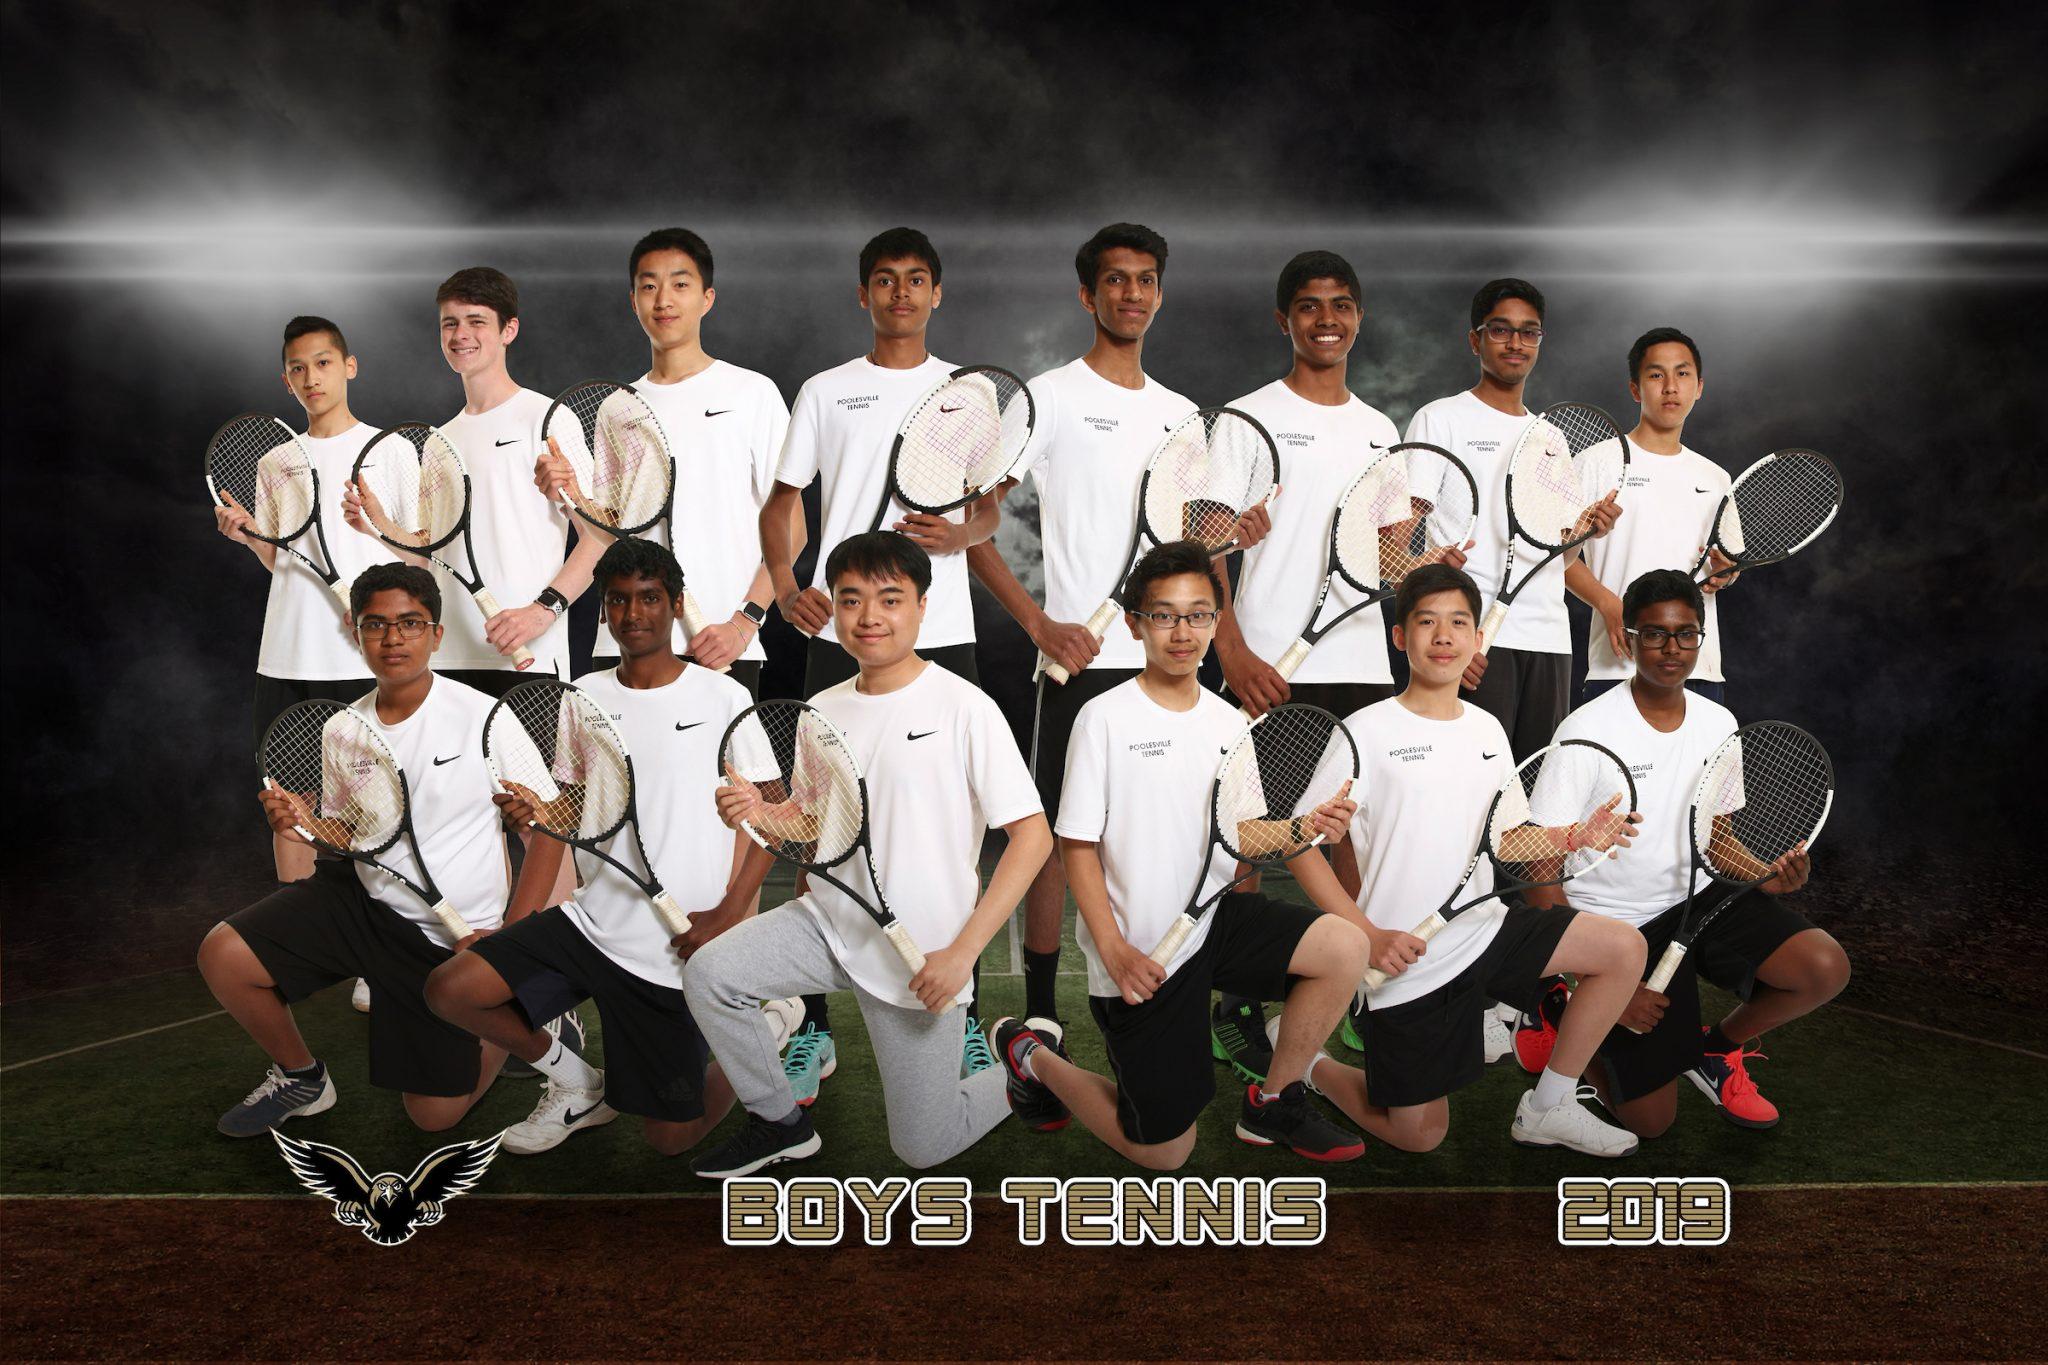 boys tennis team picture